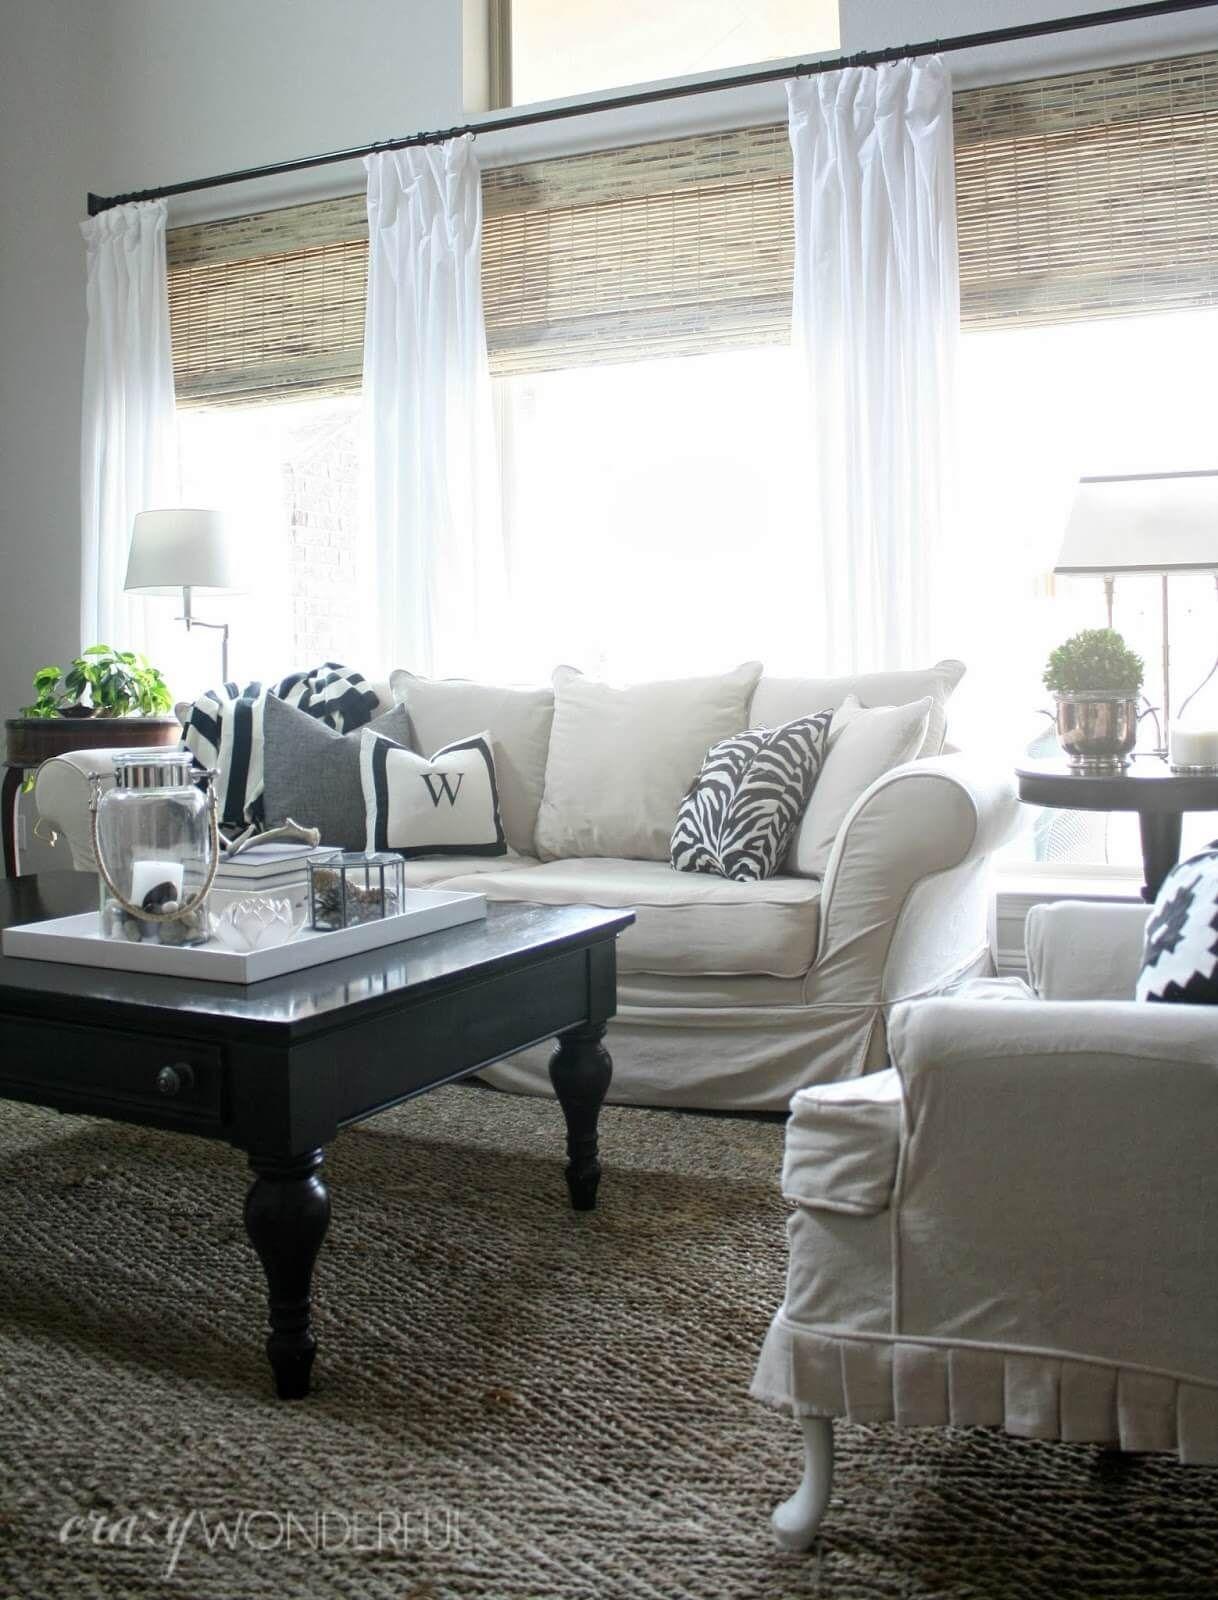 20 Modern Curtain Ideas For Living Room 2021 Window Treatments Living Room Living Room Windows Roman Shades Living Room Living room window treatments